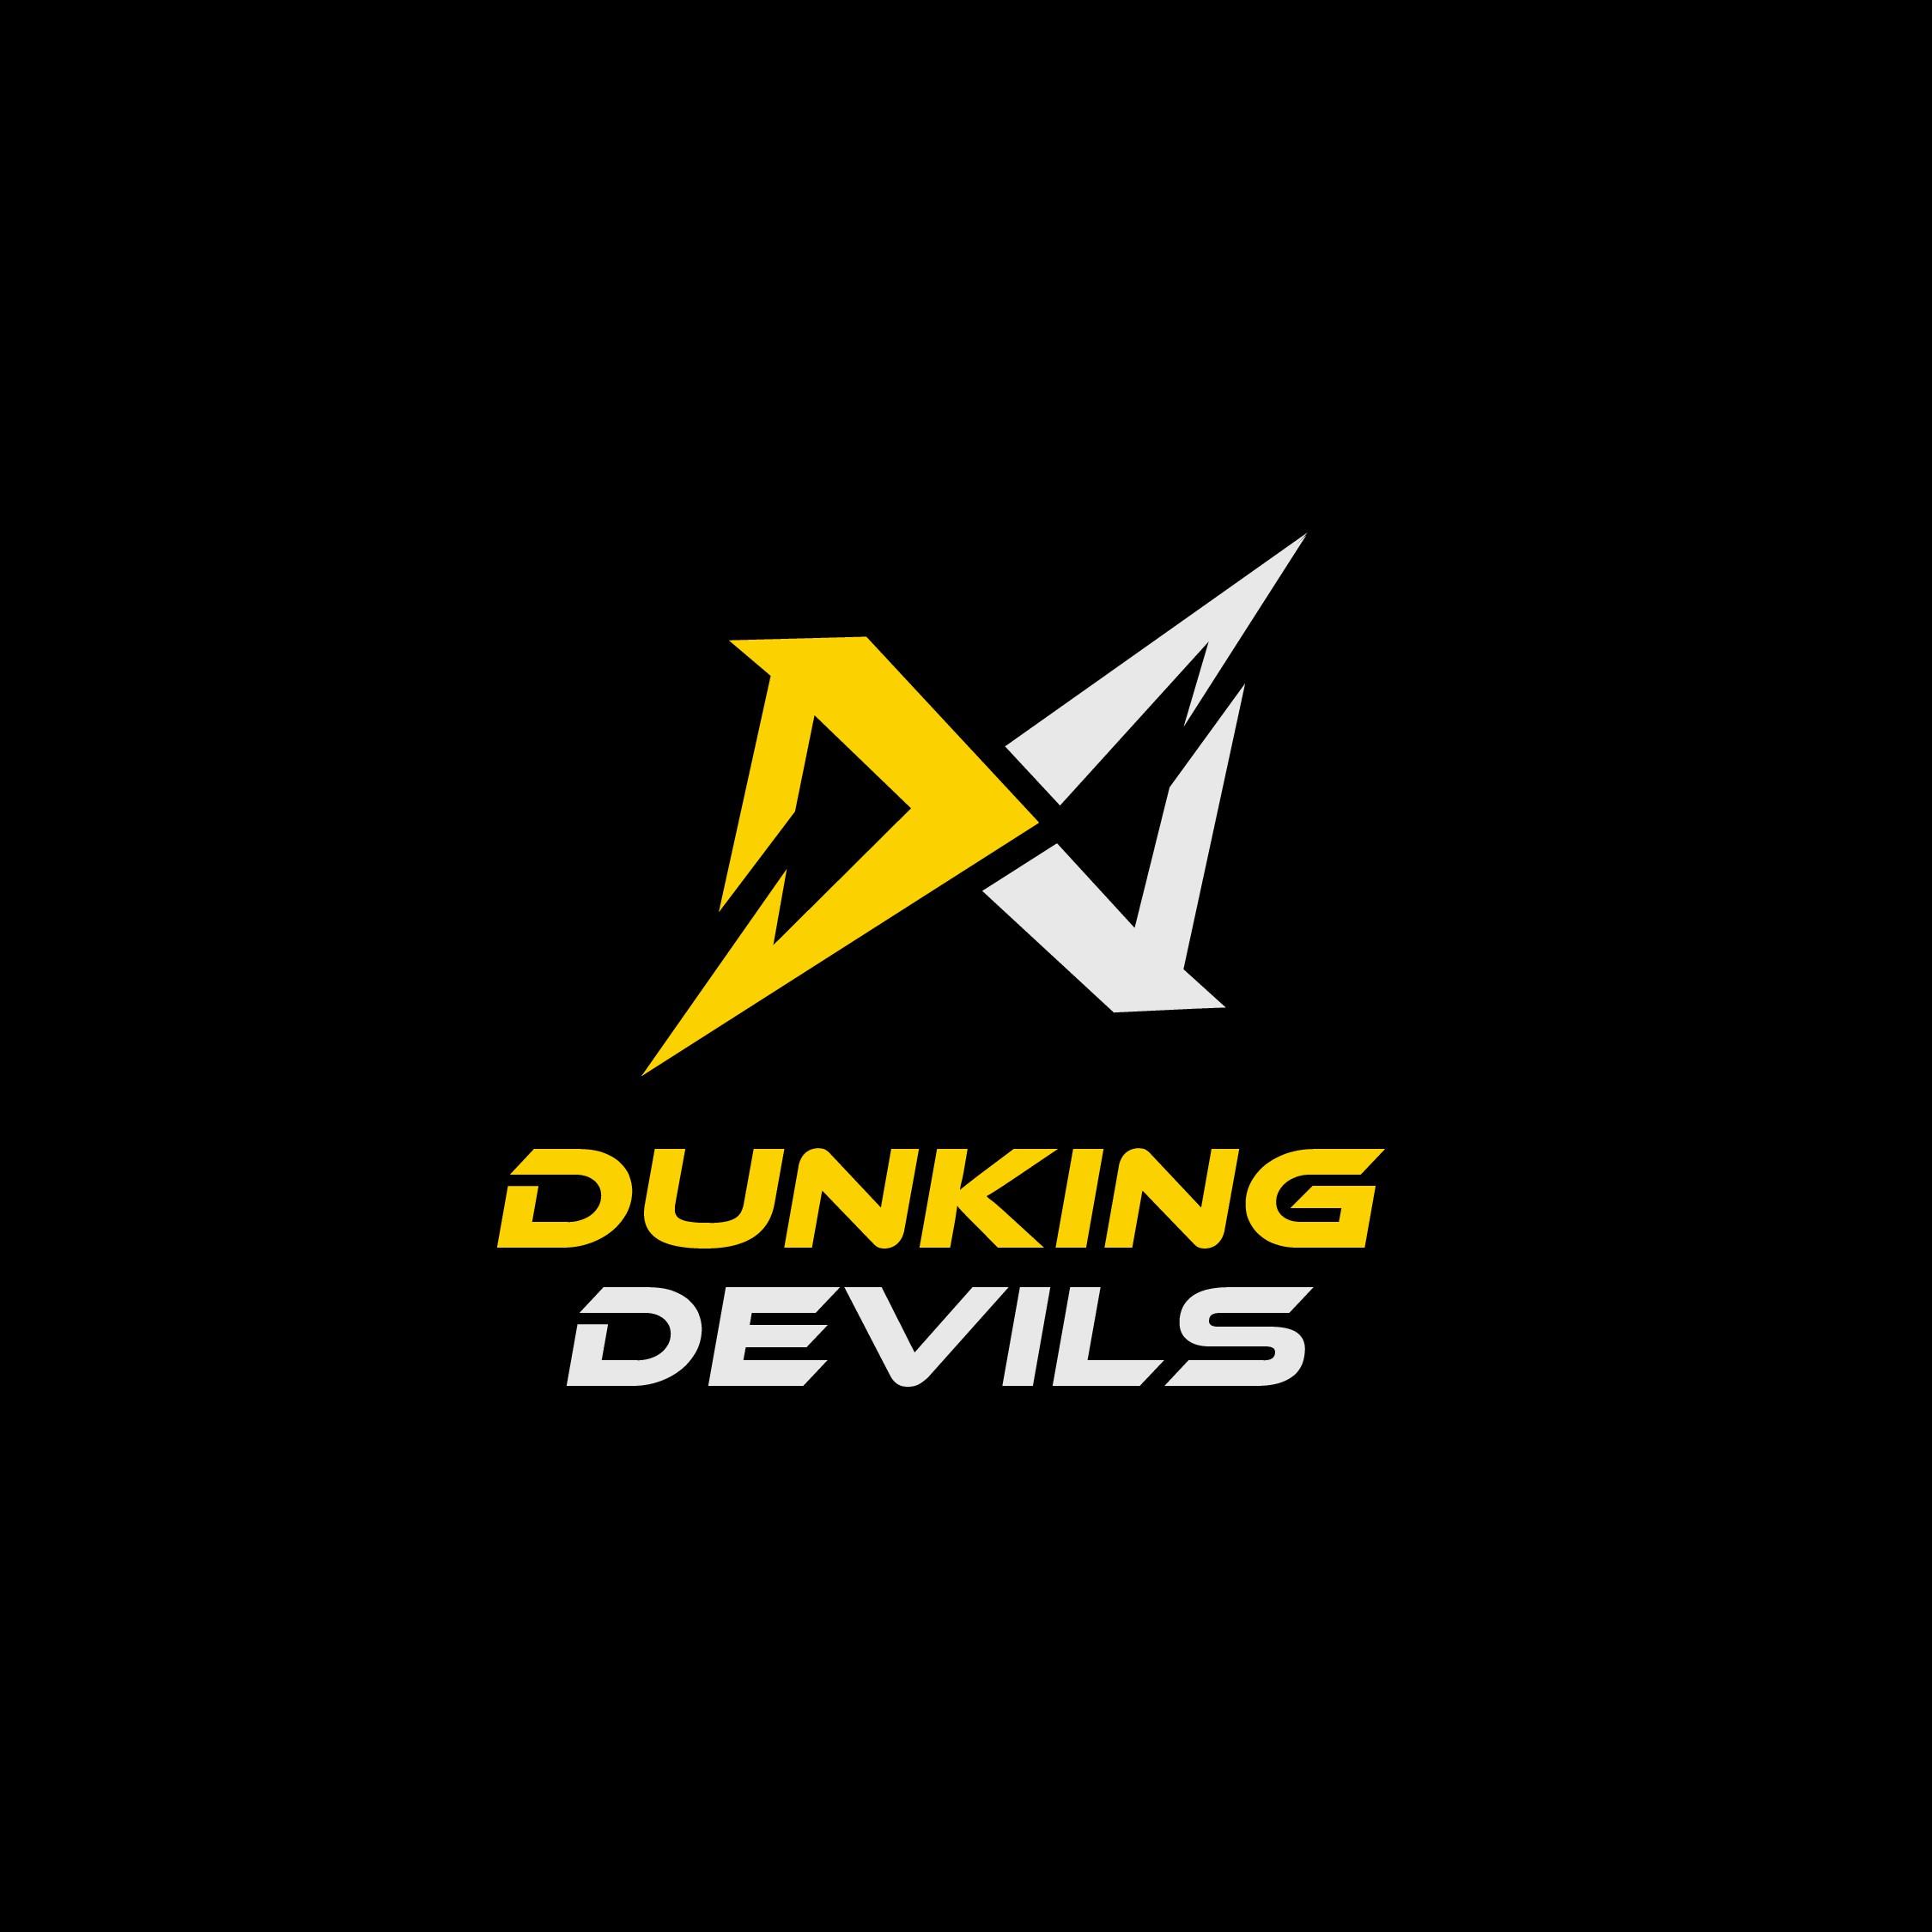 DD - Sport /artist company logo